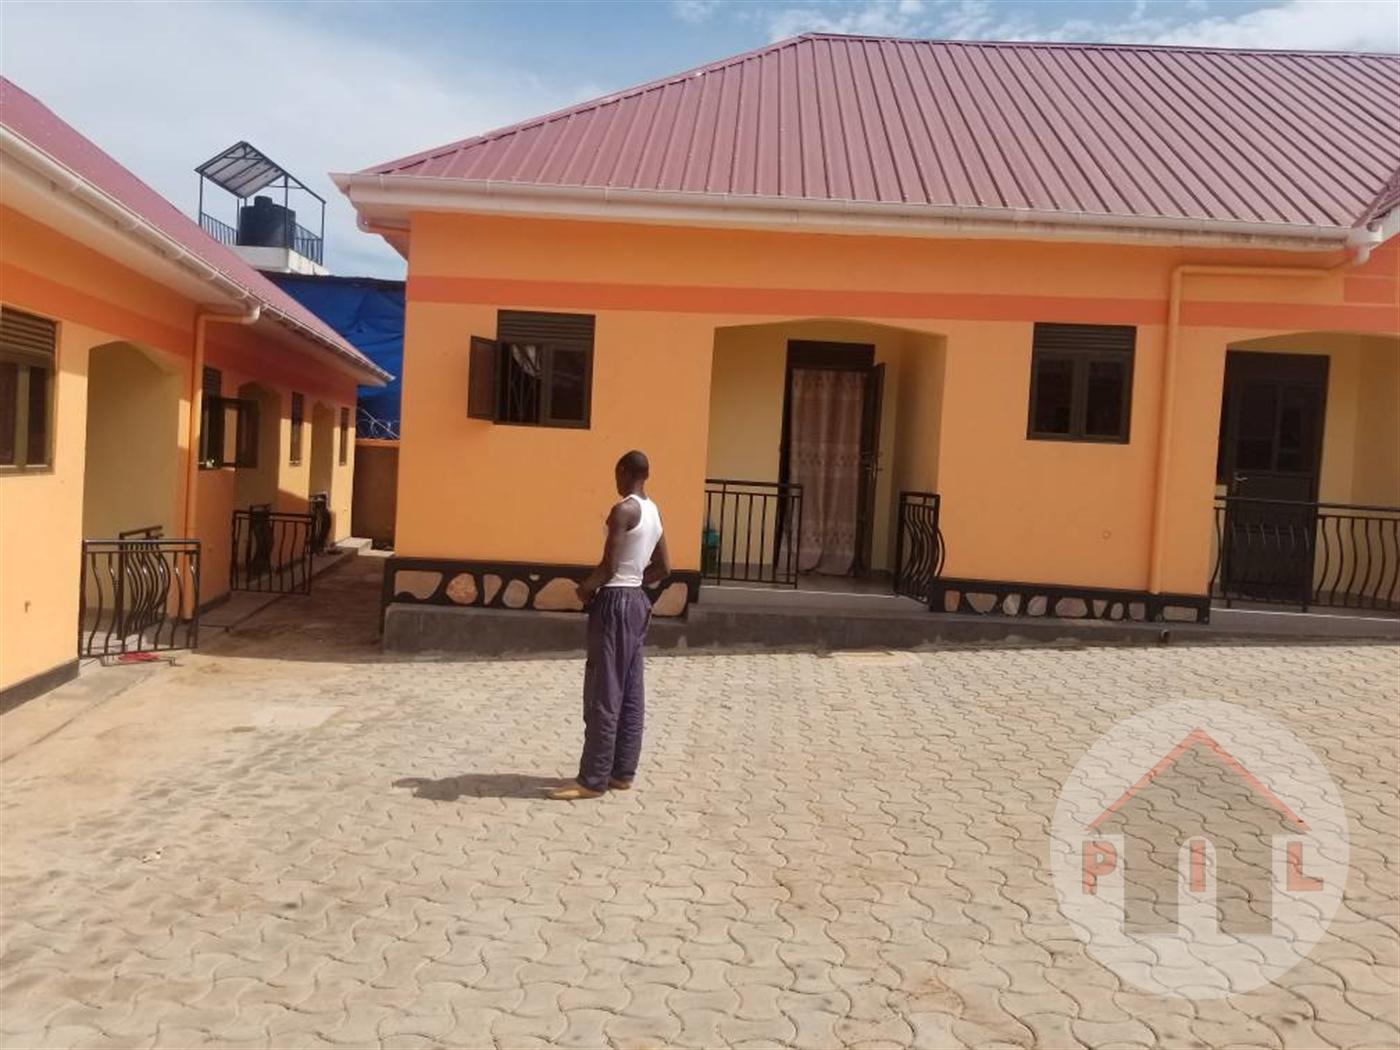 Rental units for sale in Zana Wakiso